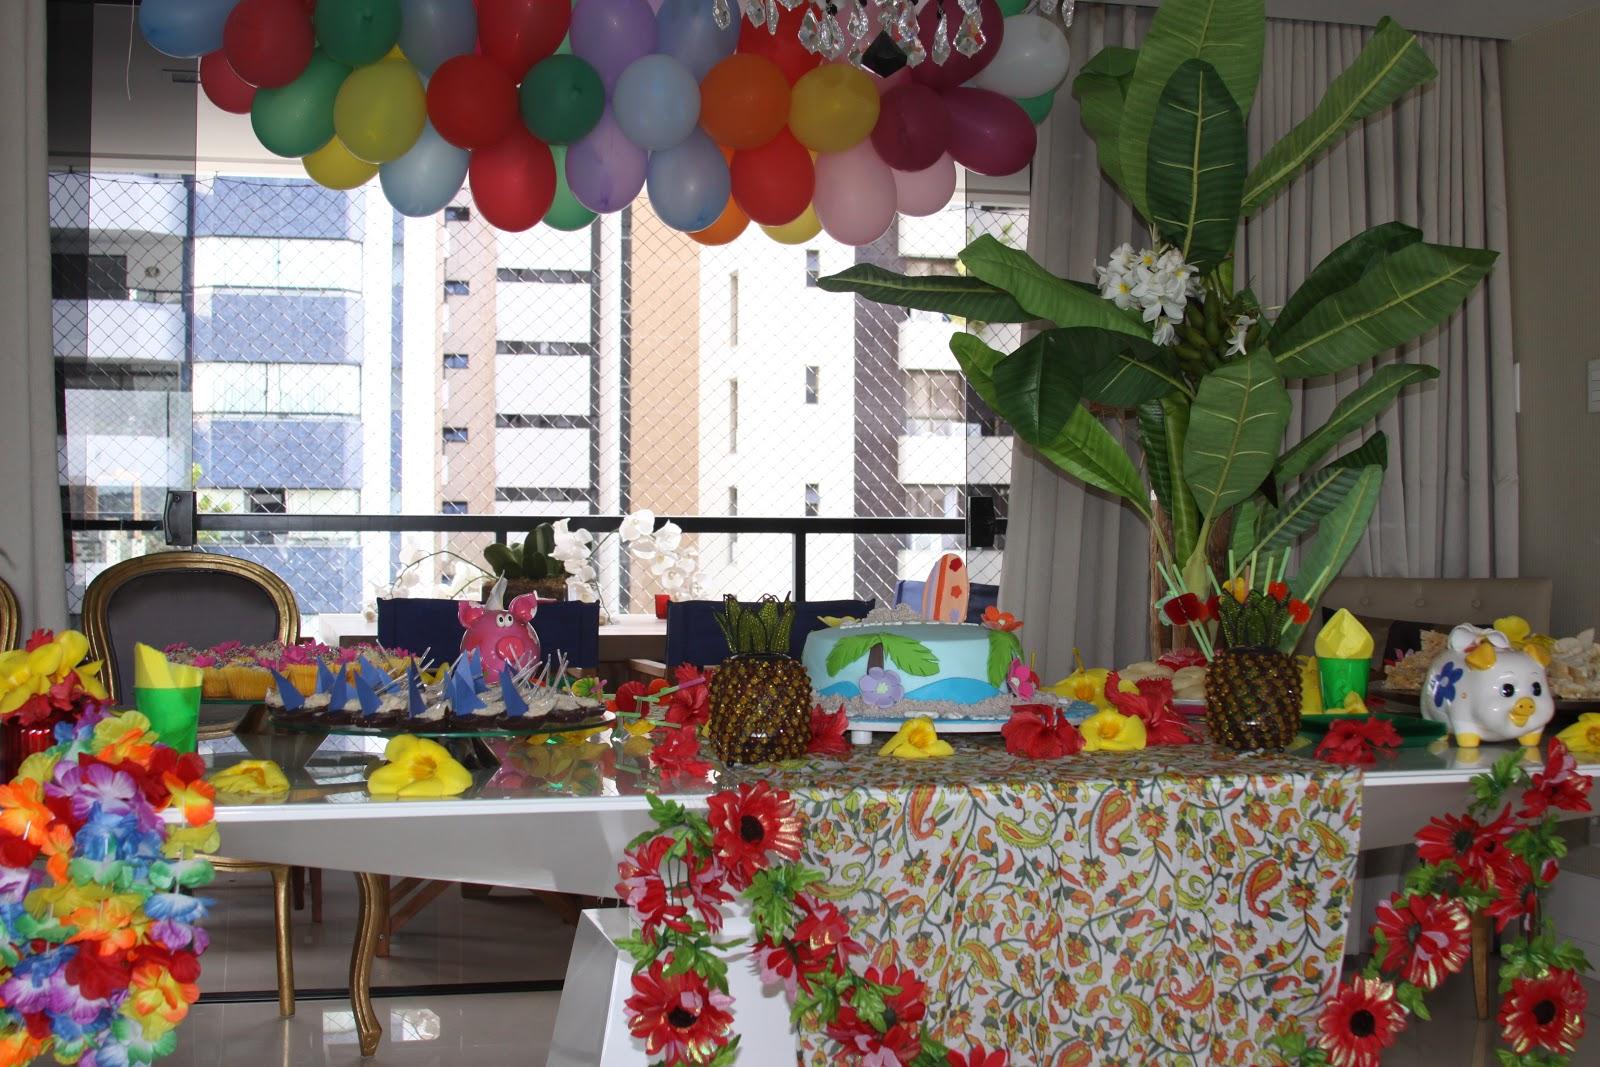 decoracao festa luau:Videos De Praia Para Luau